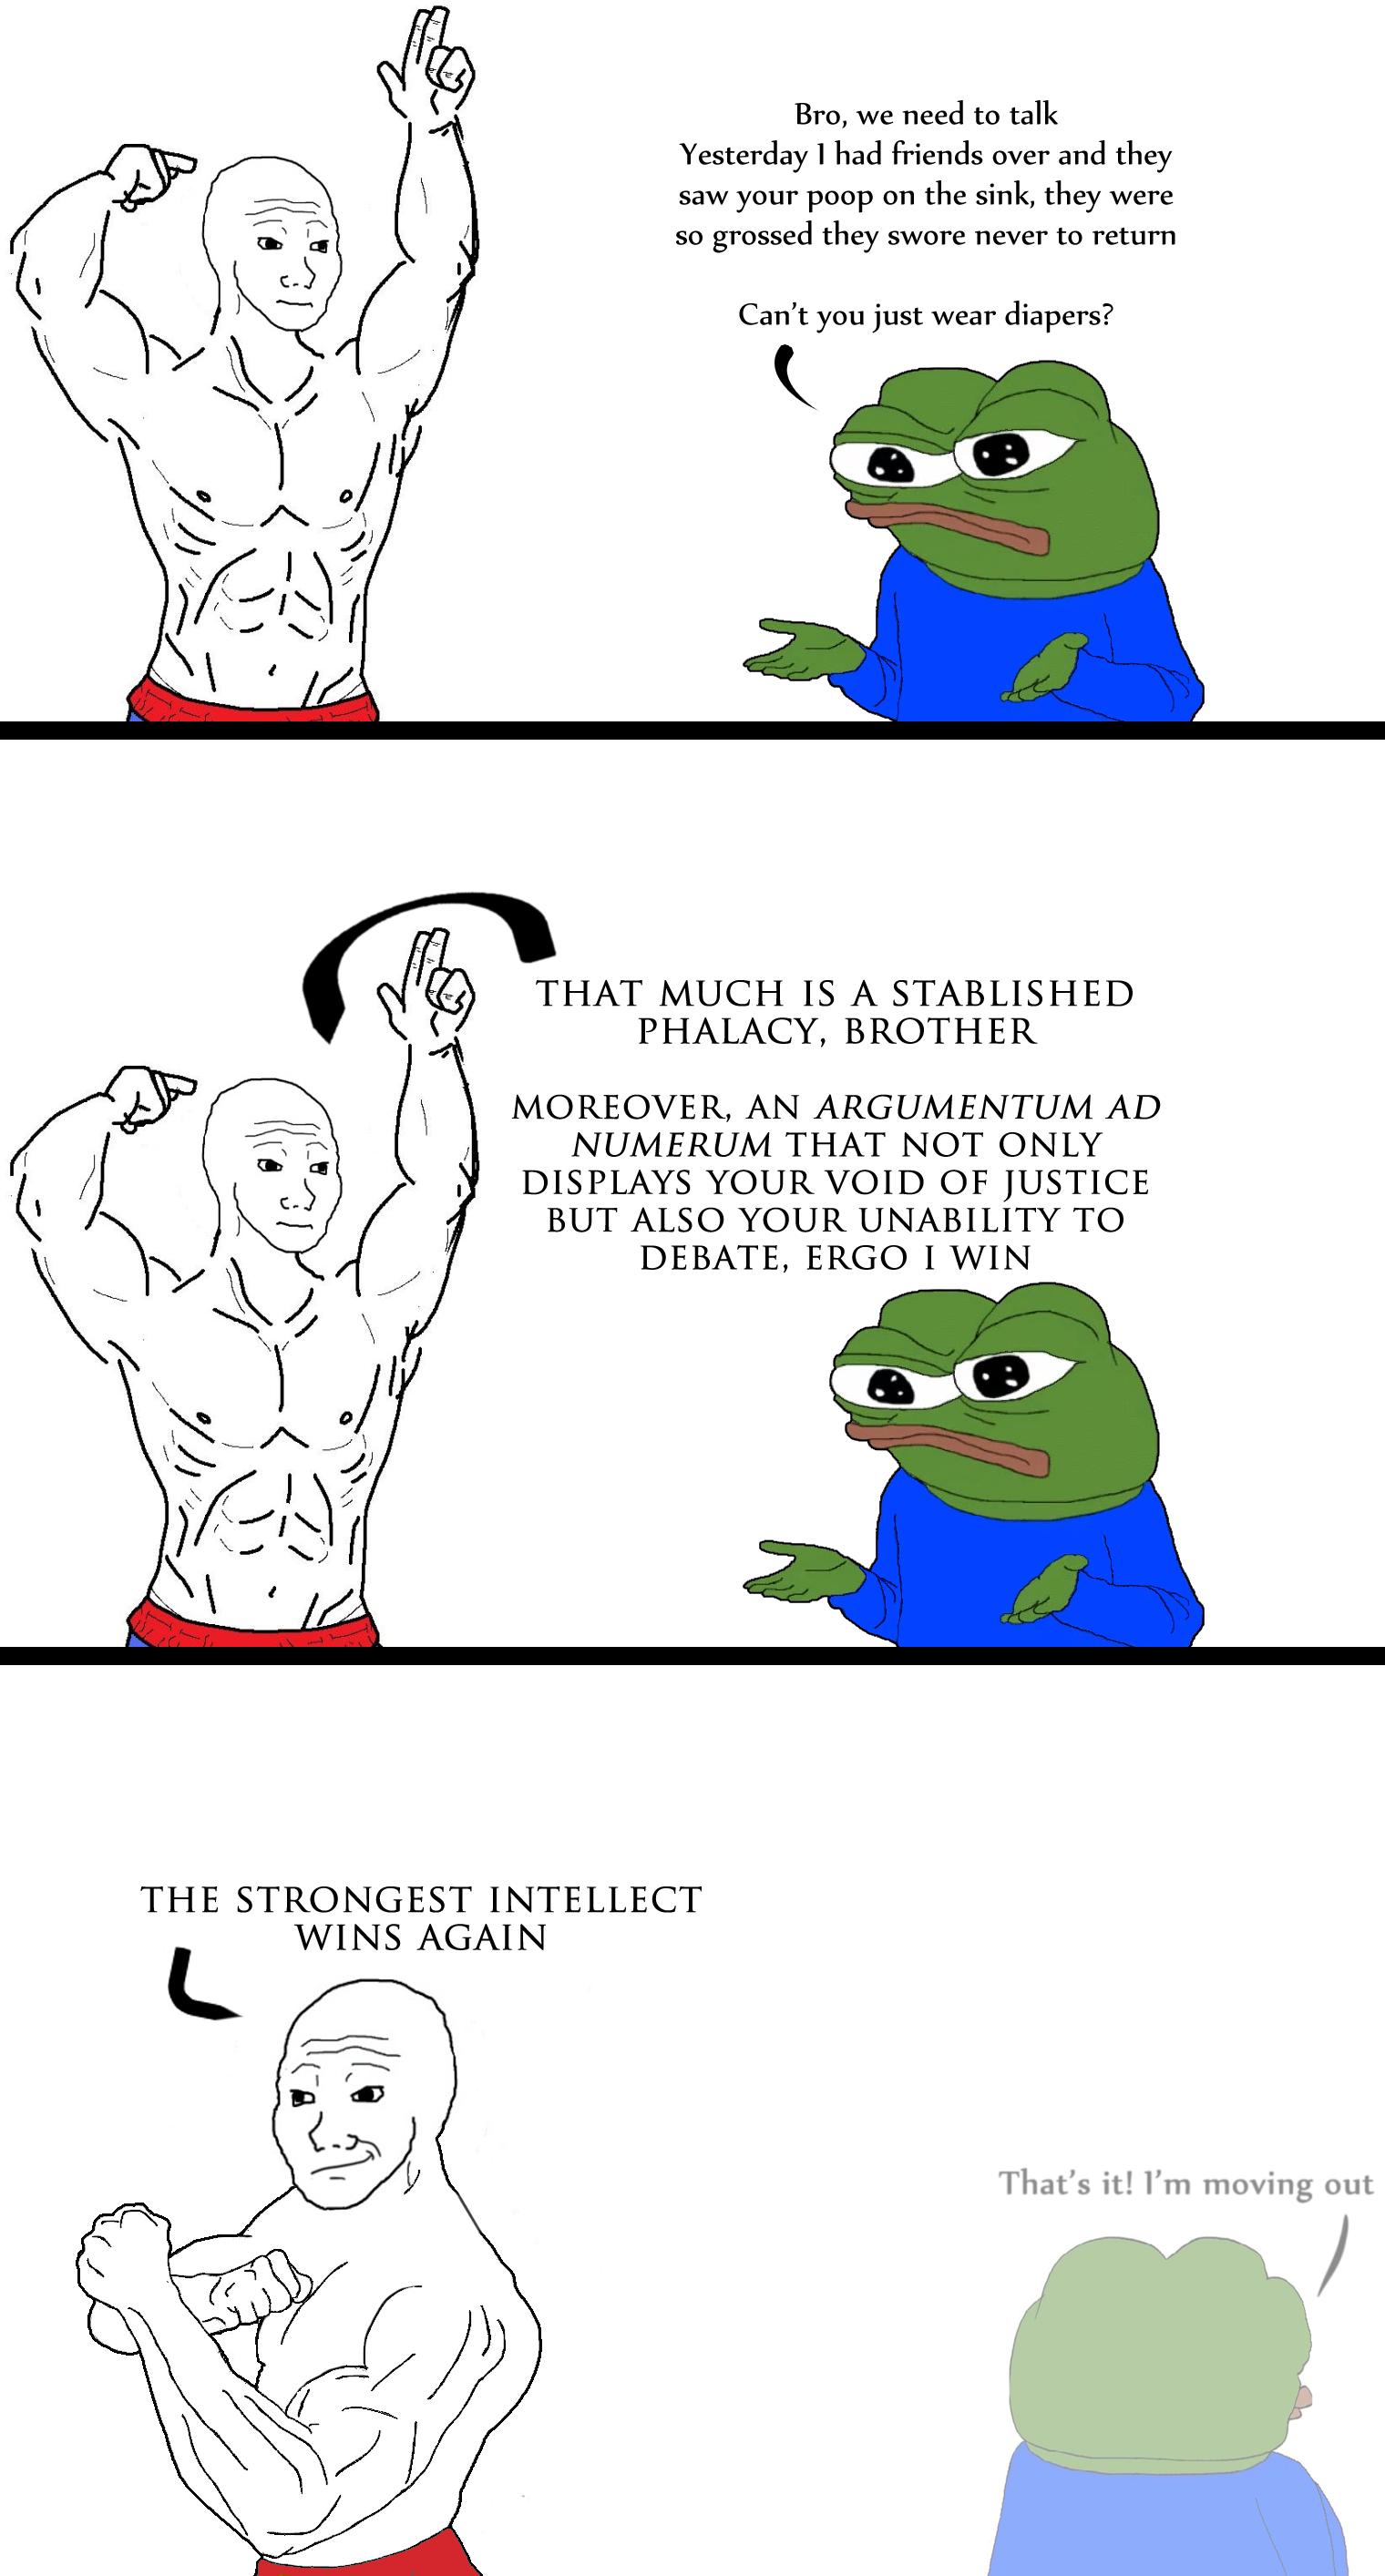 I love debates where nothing is debated except semantics